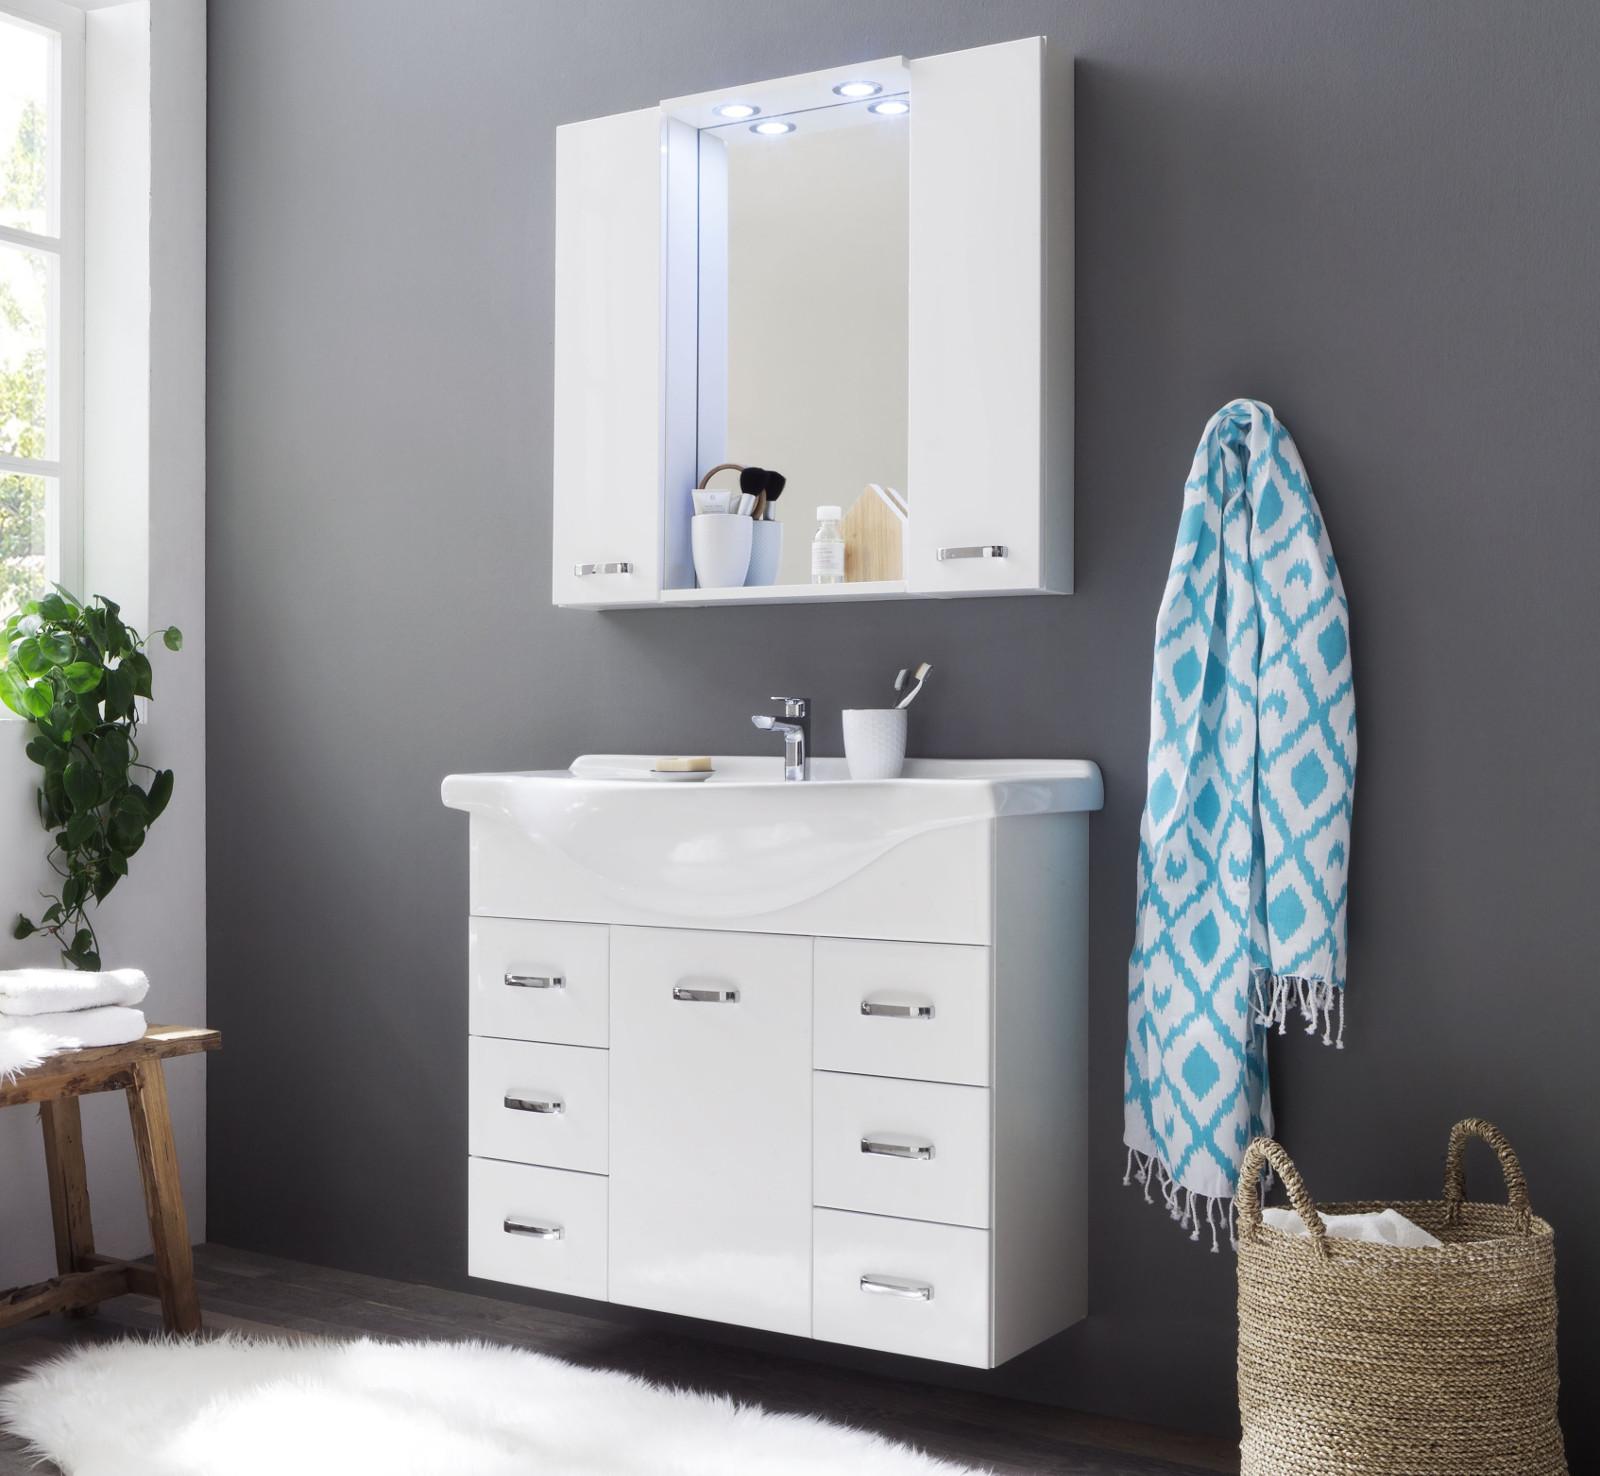 badm bel set aqua hochglanz wei 2 teilig. Black Bedroom Furniture Sets. Home Design Ideas